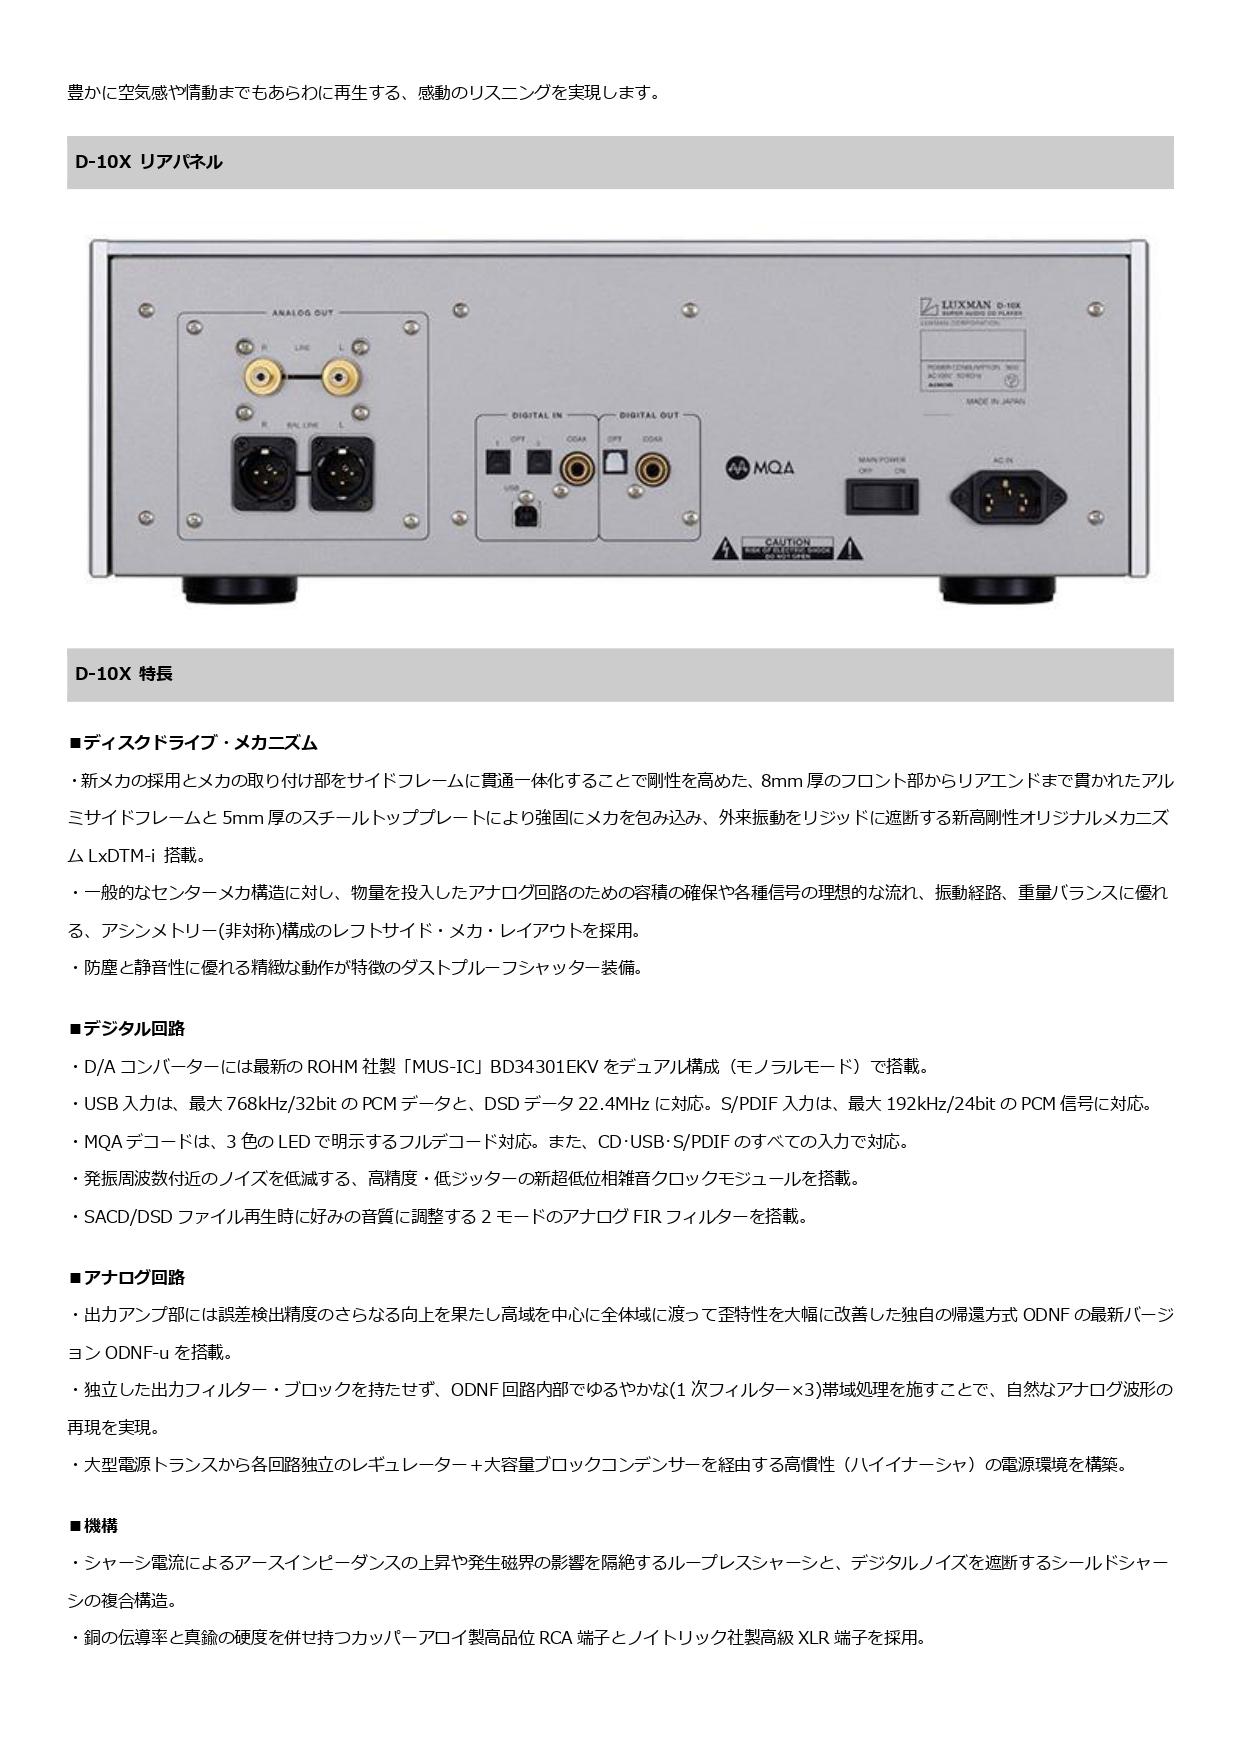 d10x_page-0002.jpg